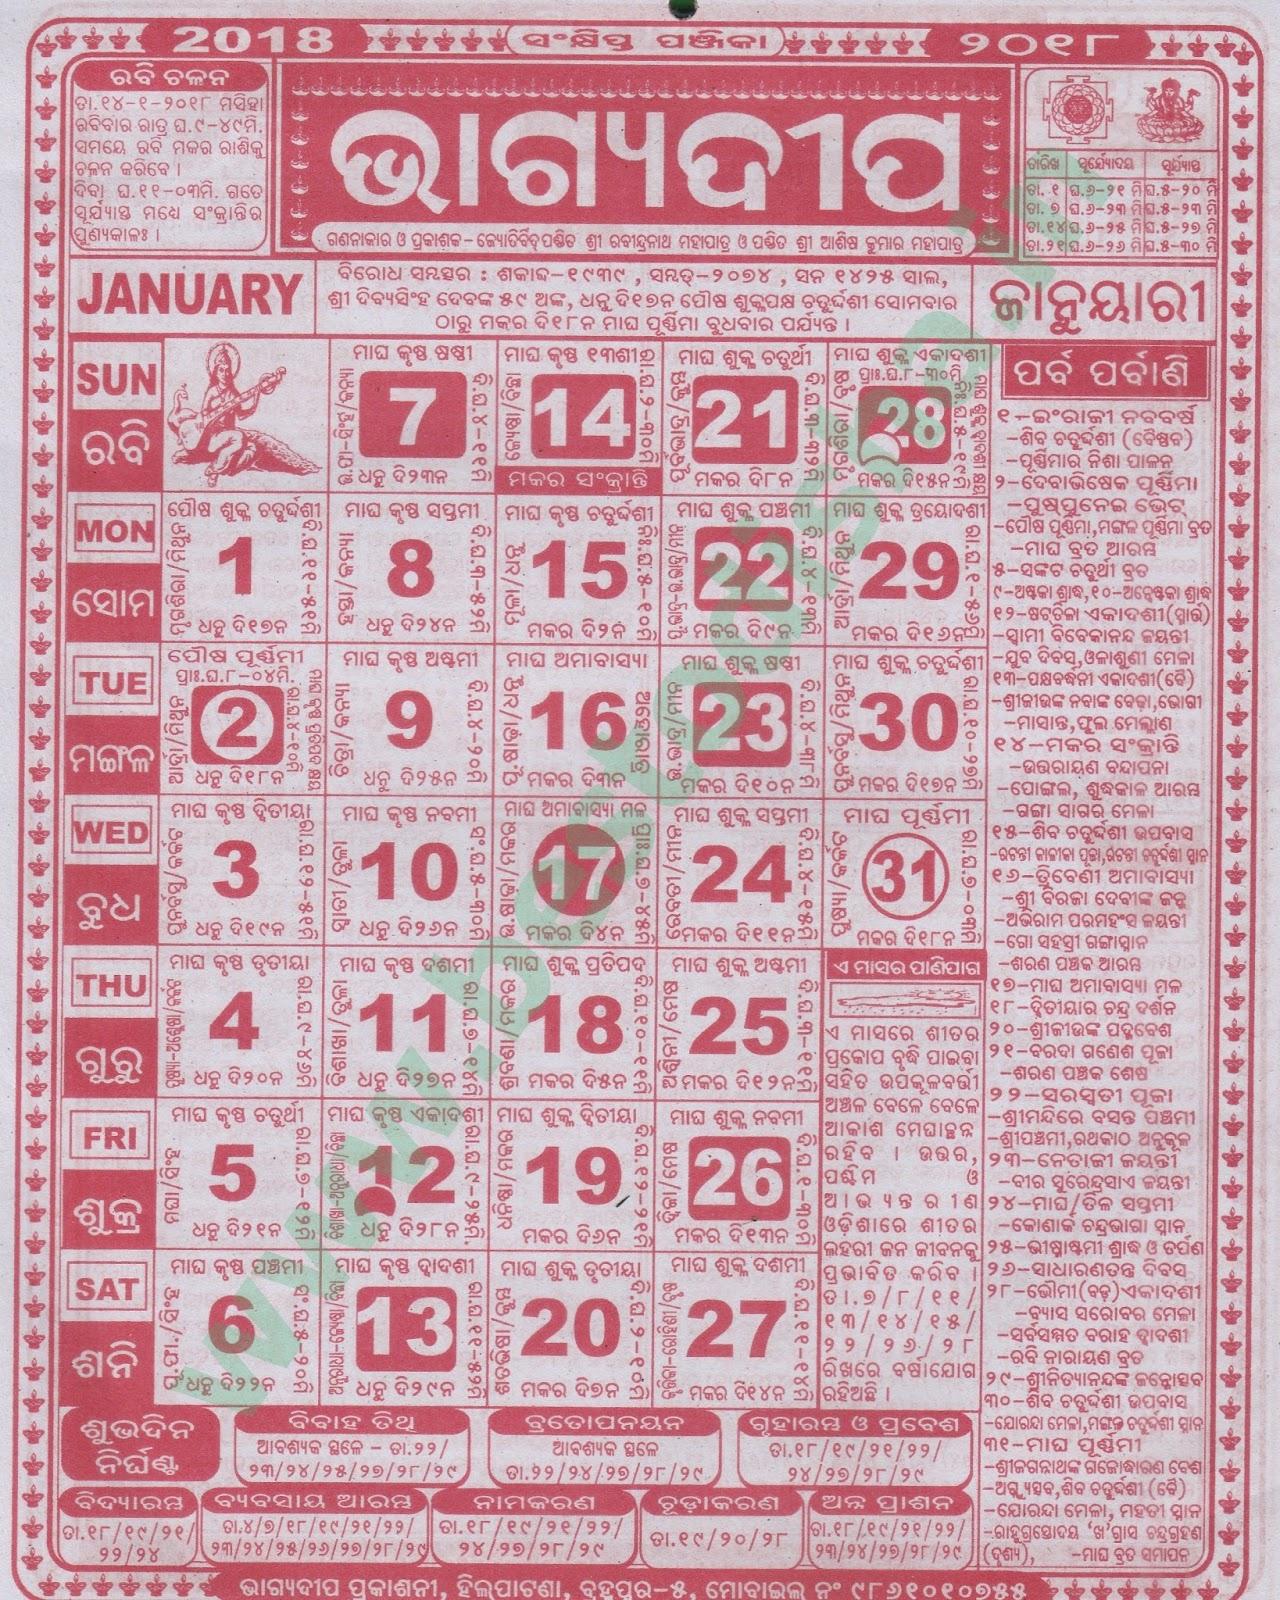 Bhagyadeep Odia Calendar 2018 | Odia Calendar 2018 | Odia within Odia Calendar Bhagyadeep